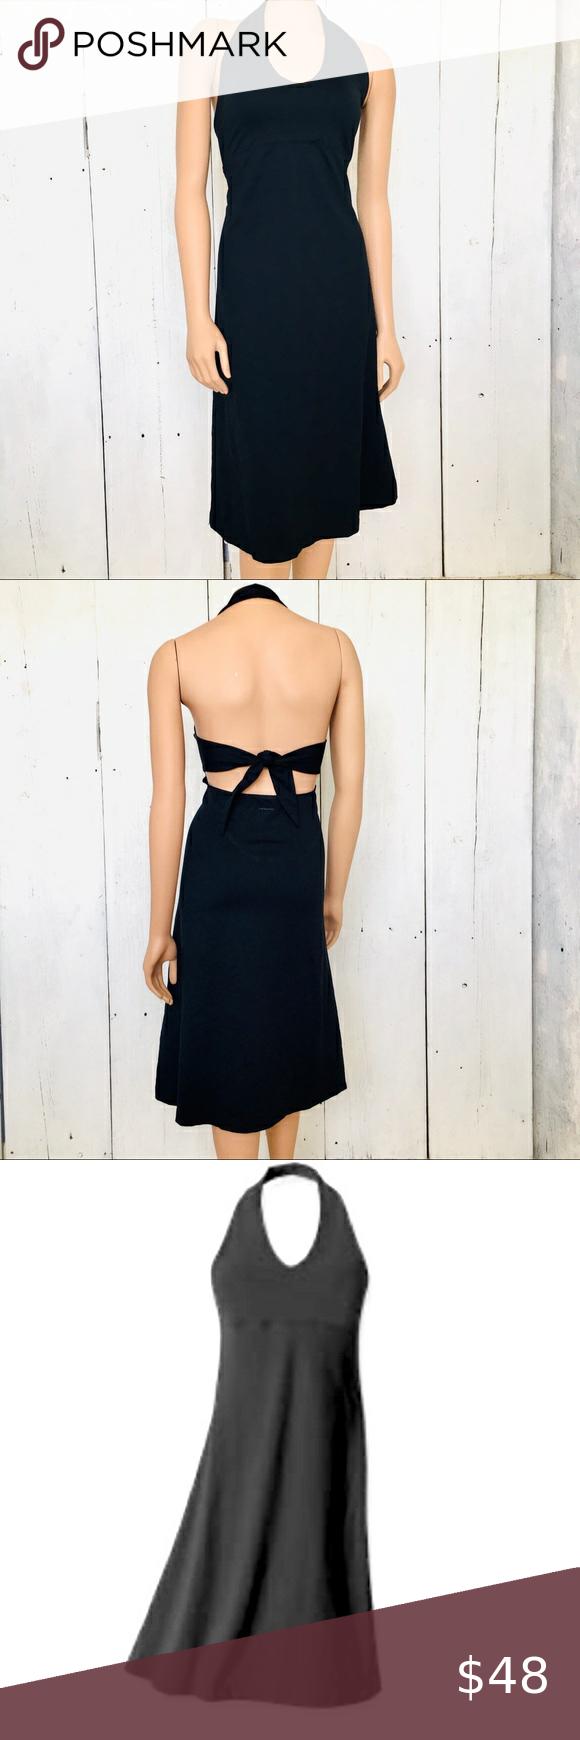 Patagonia Womens Black Stretch Halter Dress Xl Stretch Halter Dress Womens Black Dress Black Stretch [ 1740 x 580 Pixel ]